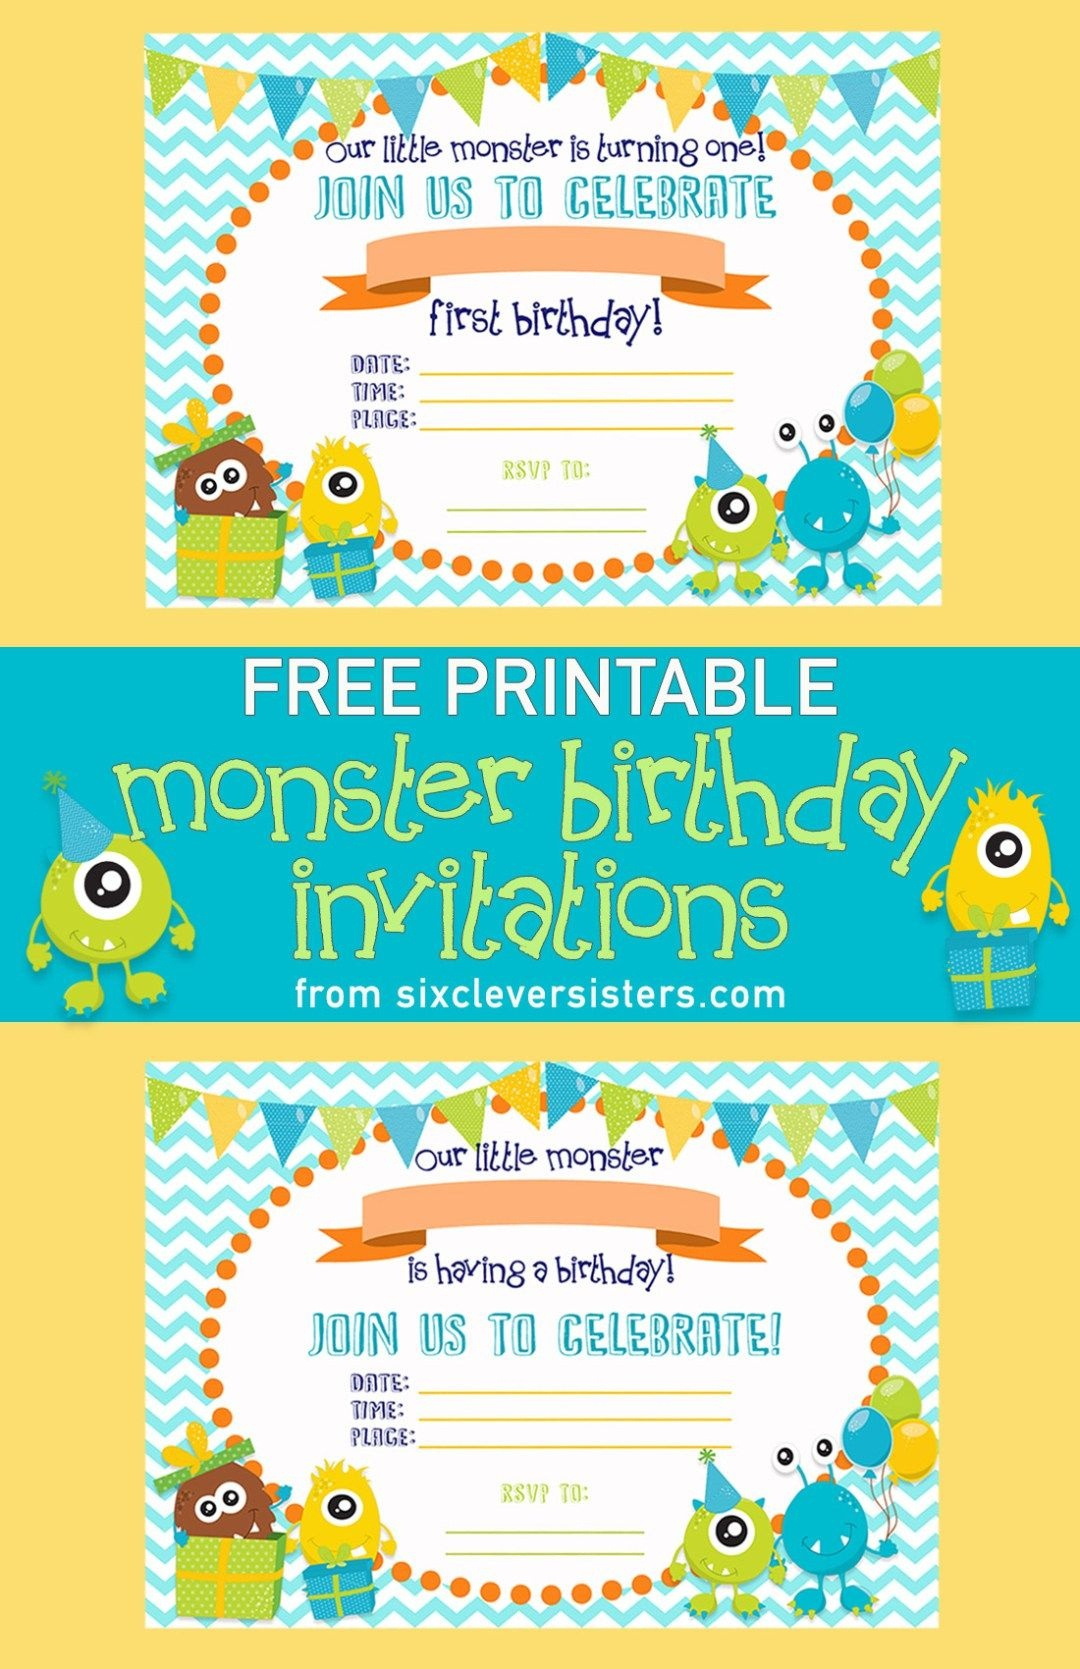 Free Printable Monster Birthday Invitations | Birthday One | Pinterest - Free Printable Birthday Invitations Pinterest